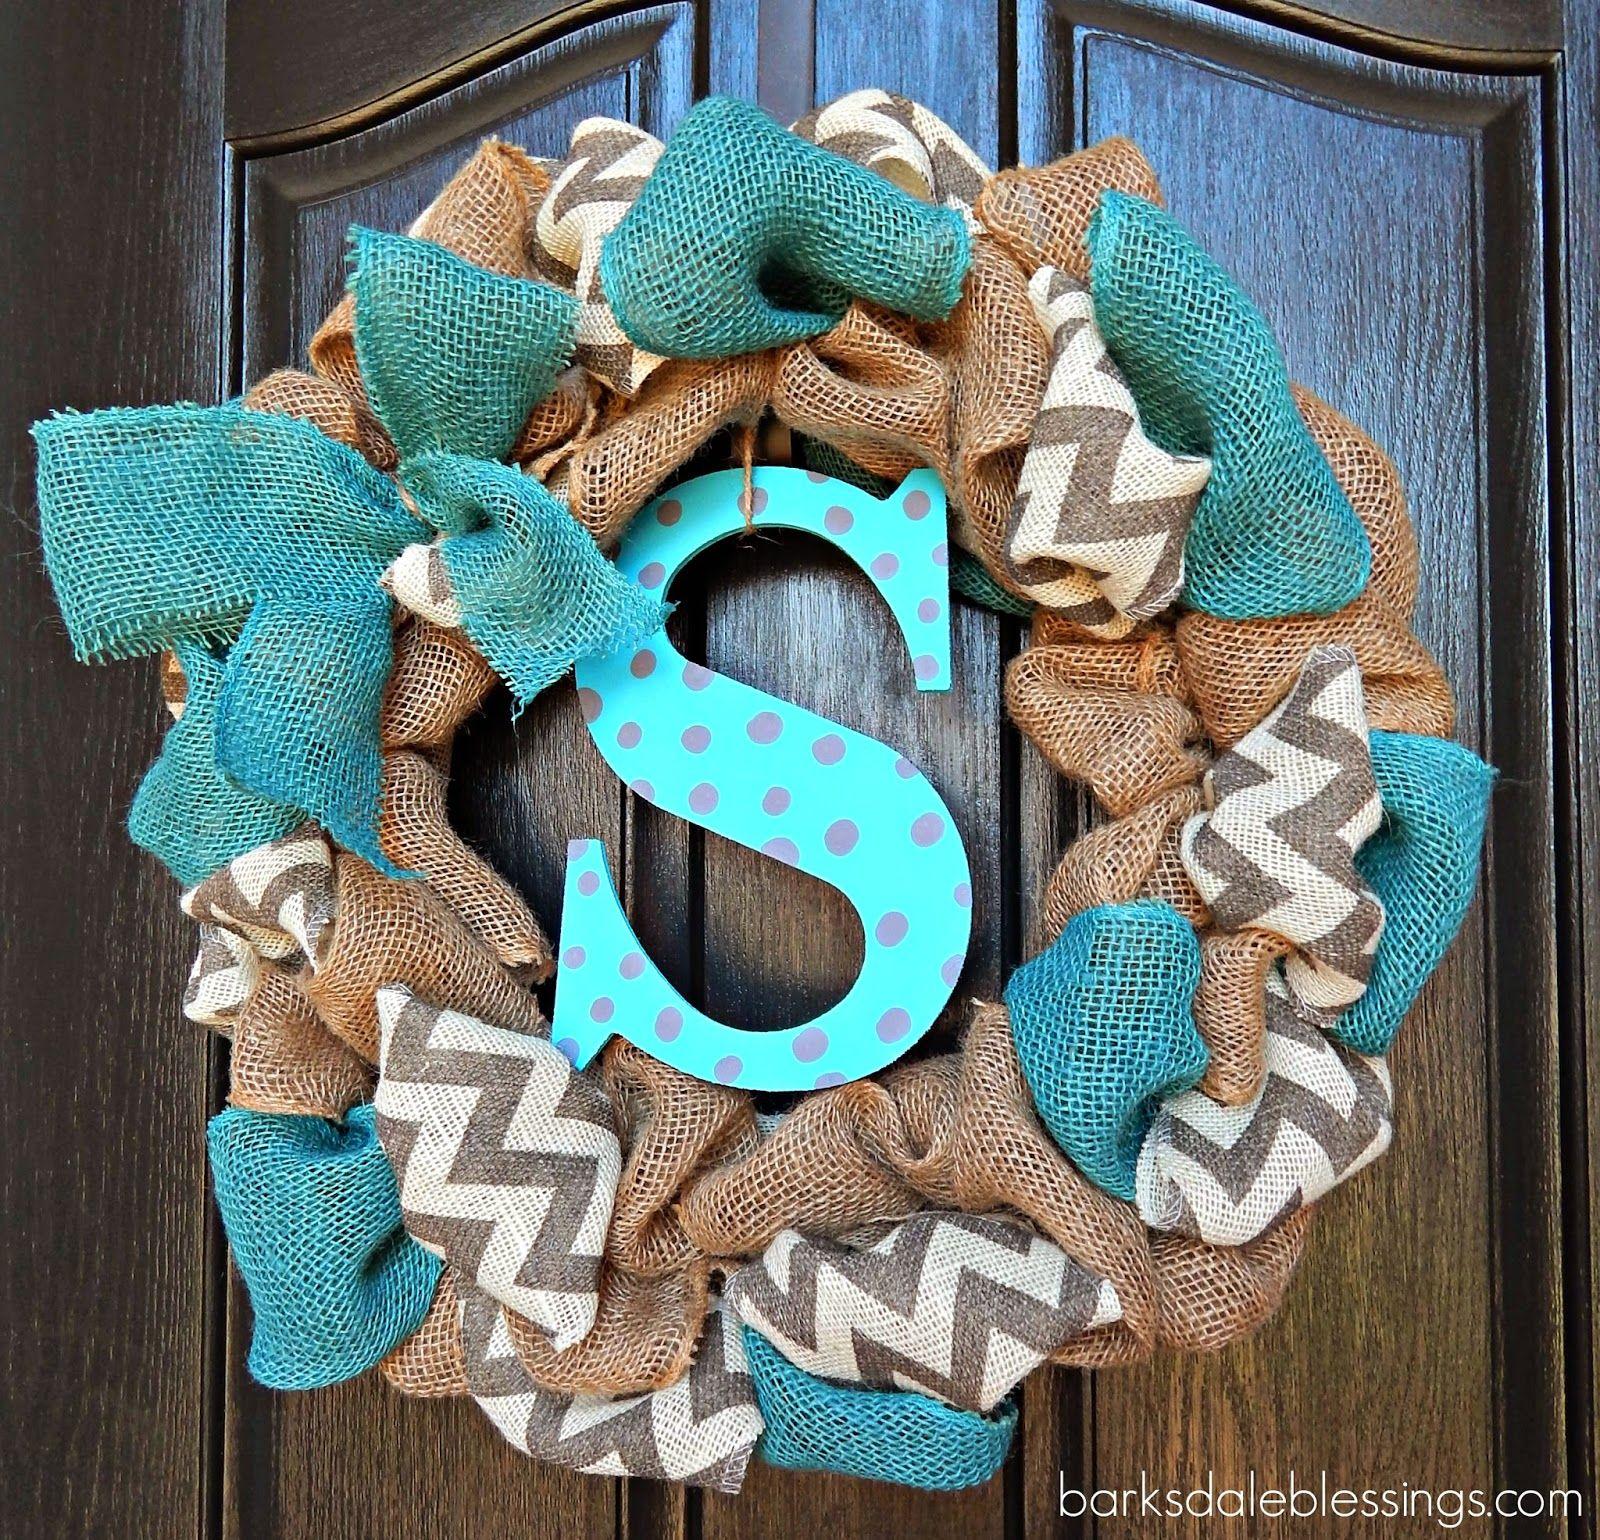 Ribbon wreath tutorial on wire hanger - Barksdale Blessings Diy Burlap Ribbon Wreath